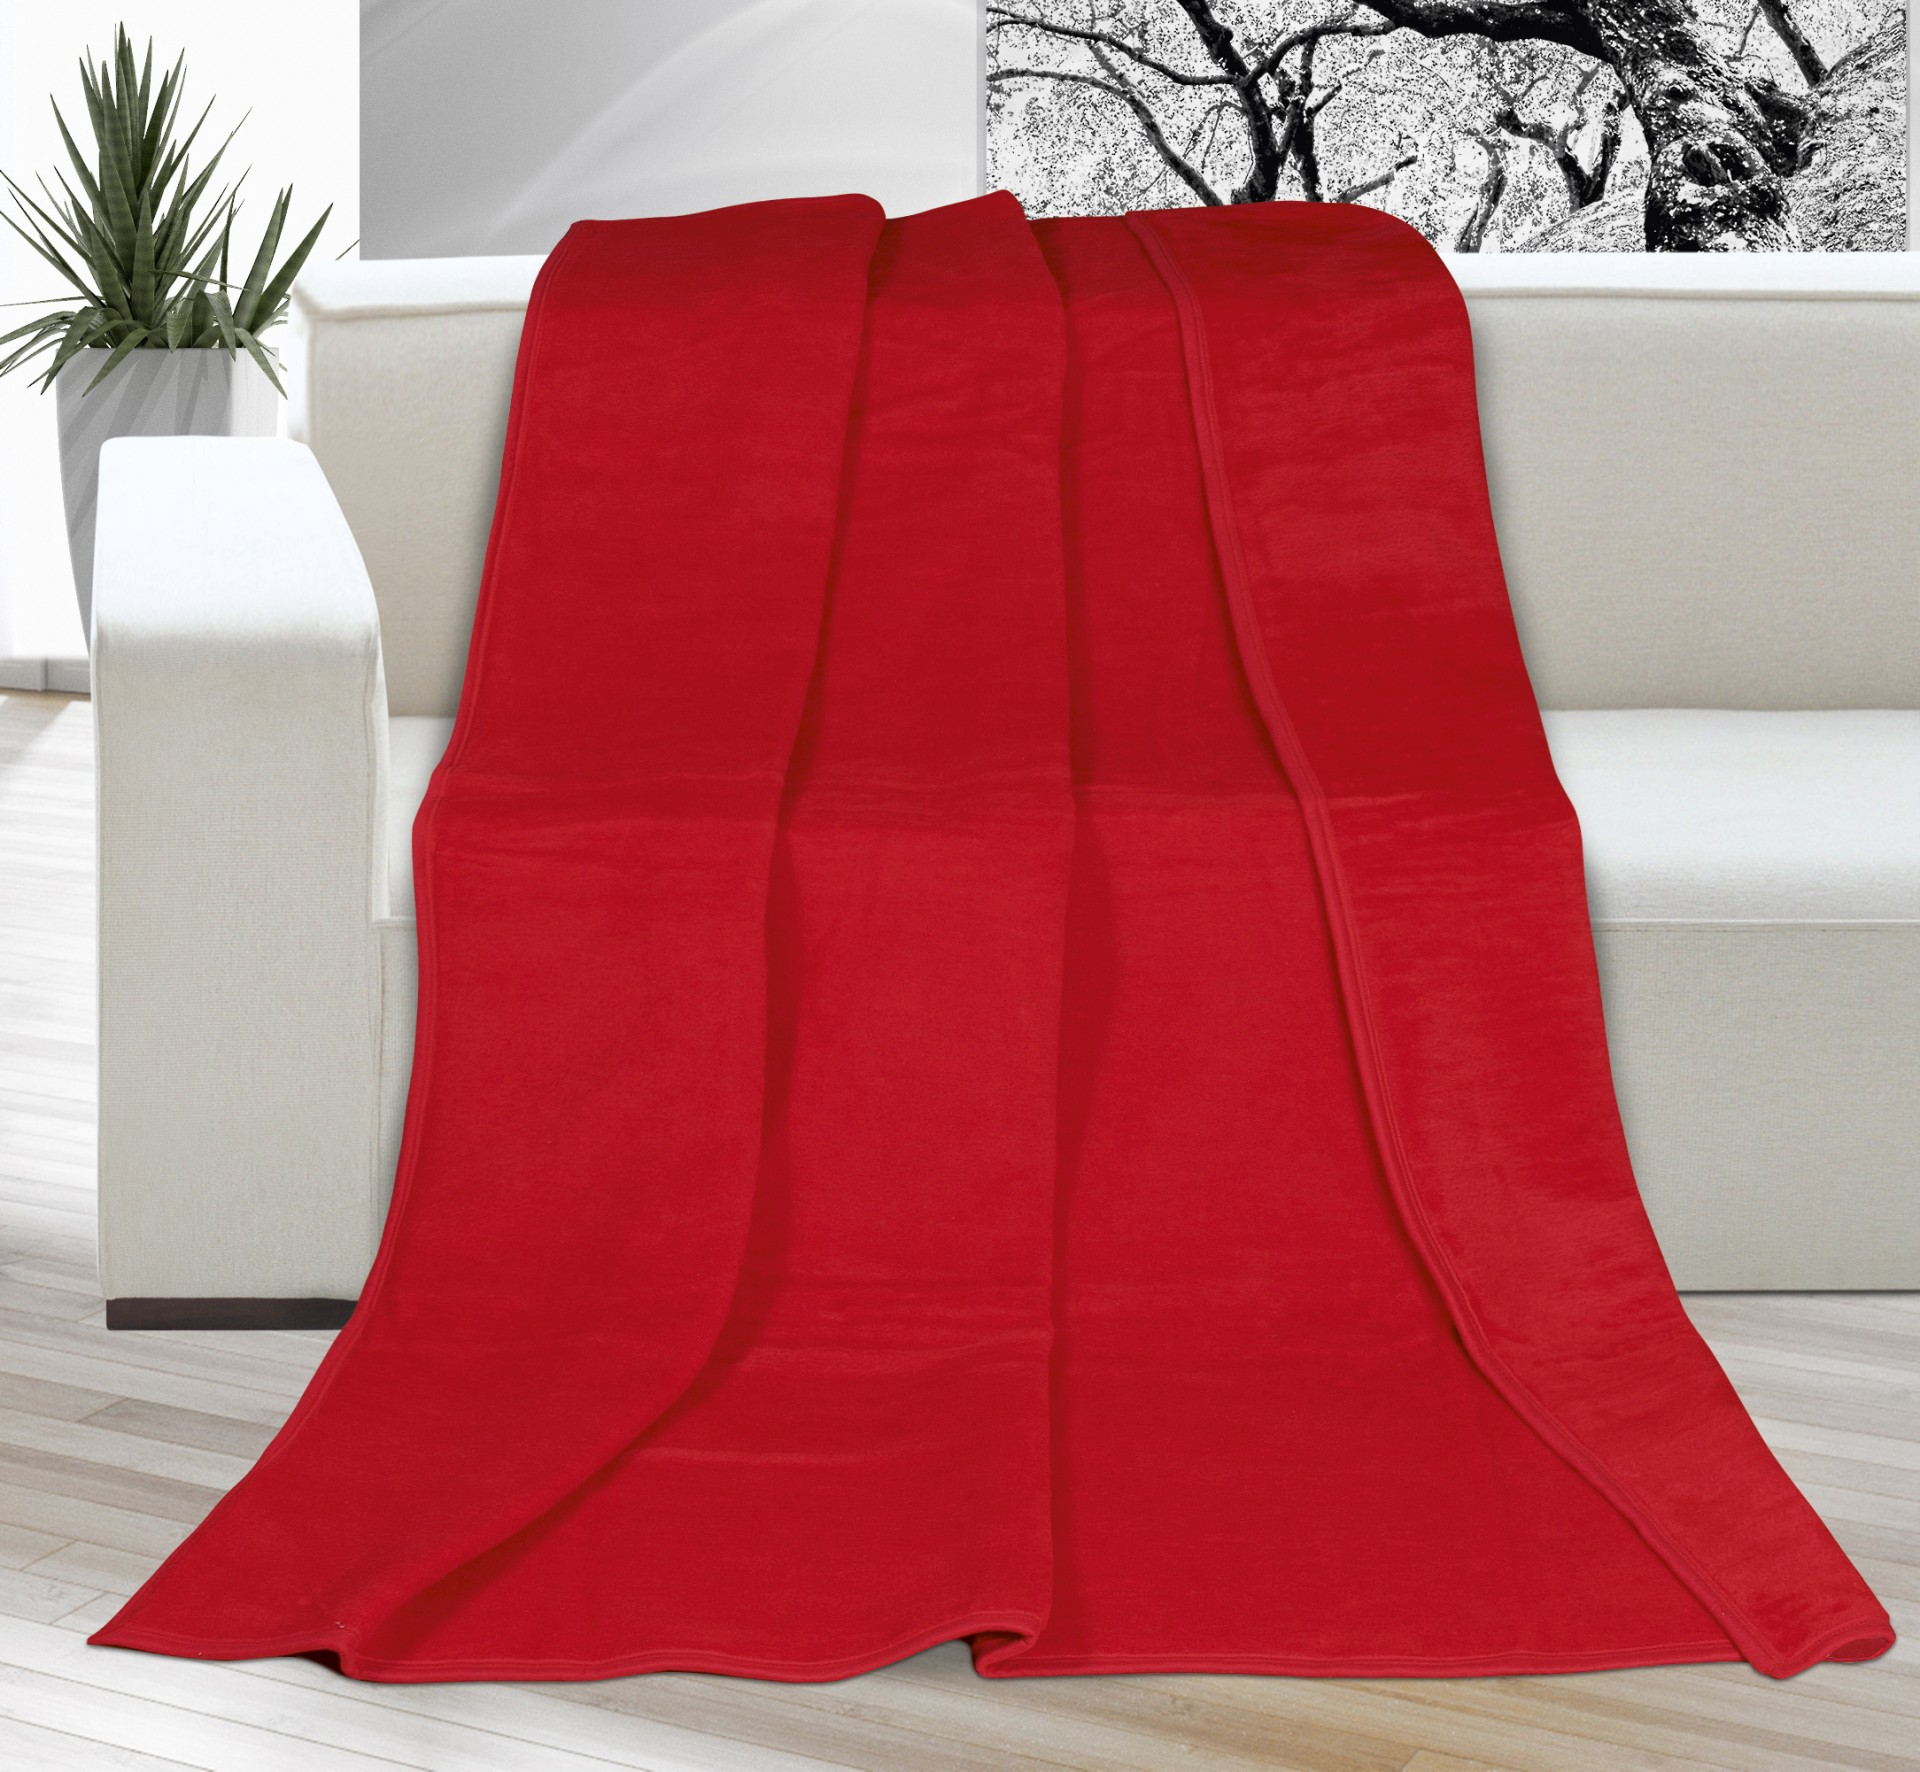 Deka Kira PLUS jednolůžko 150x200cm červená